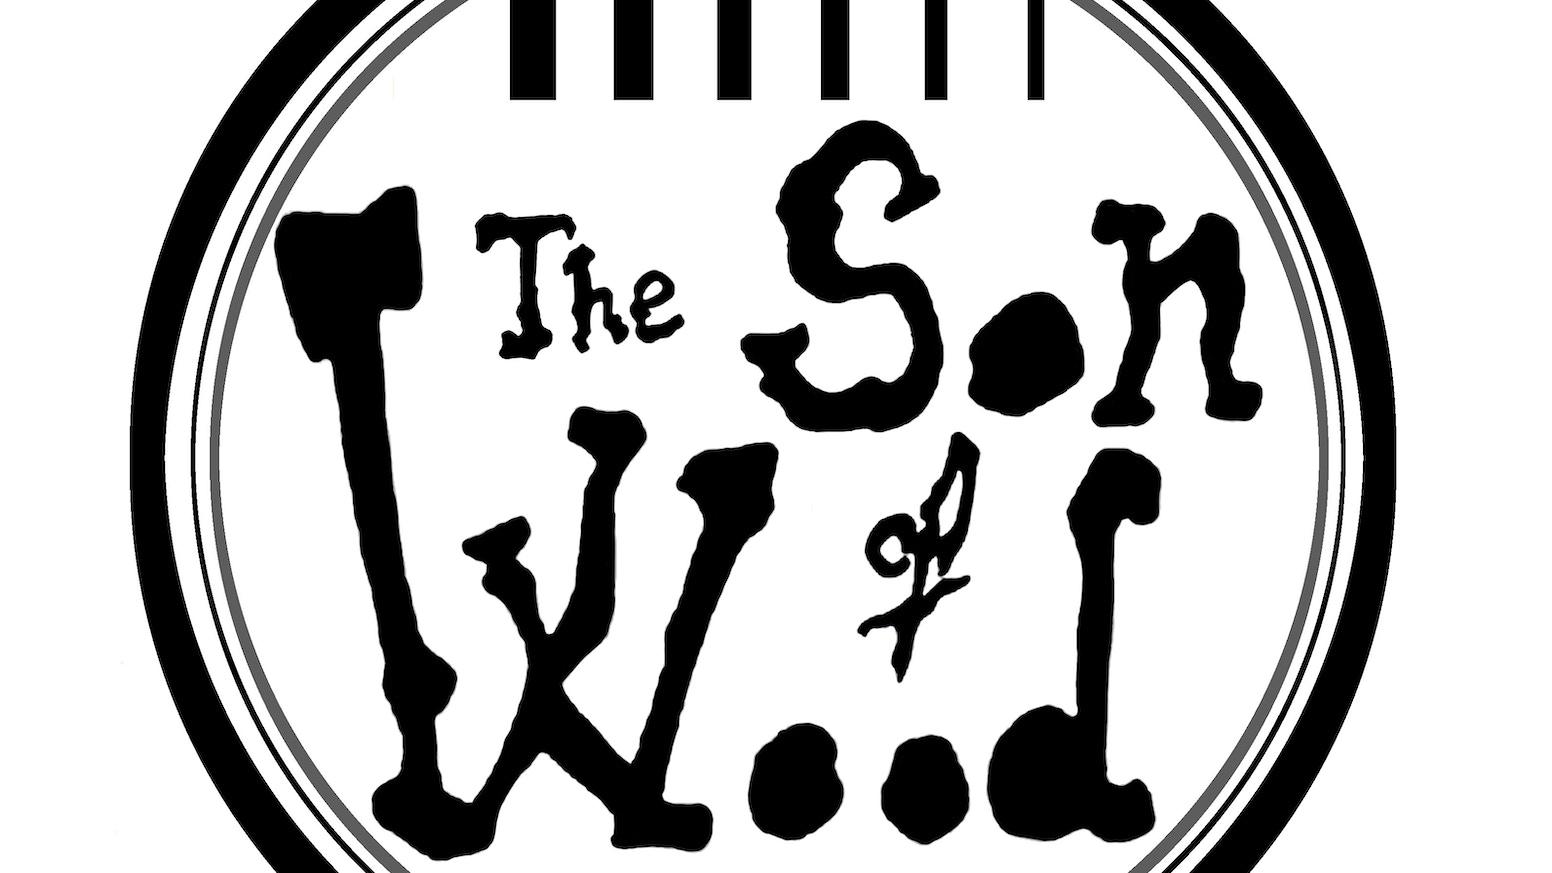 The son of Wood. Grabación del Primer EP by The son of